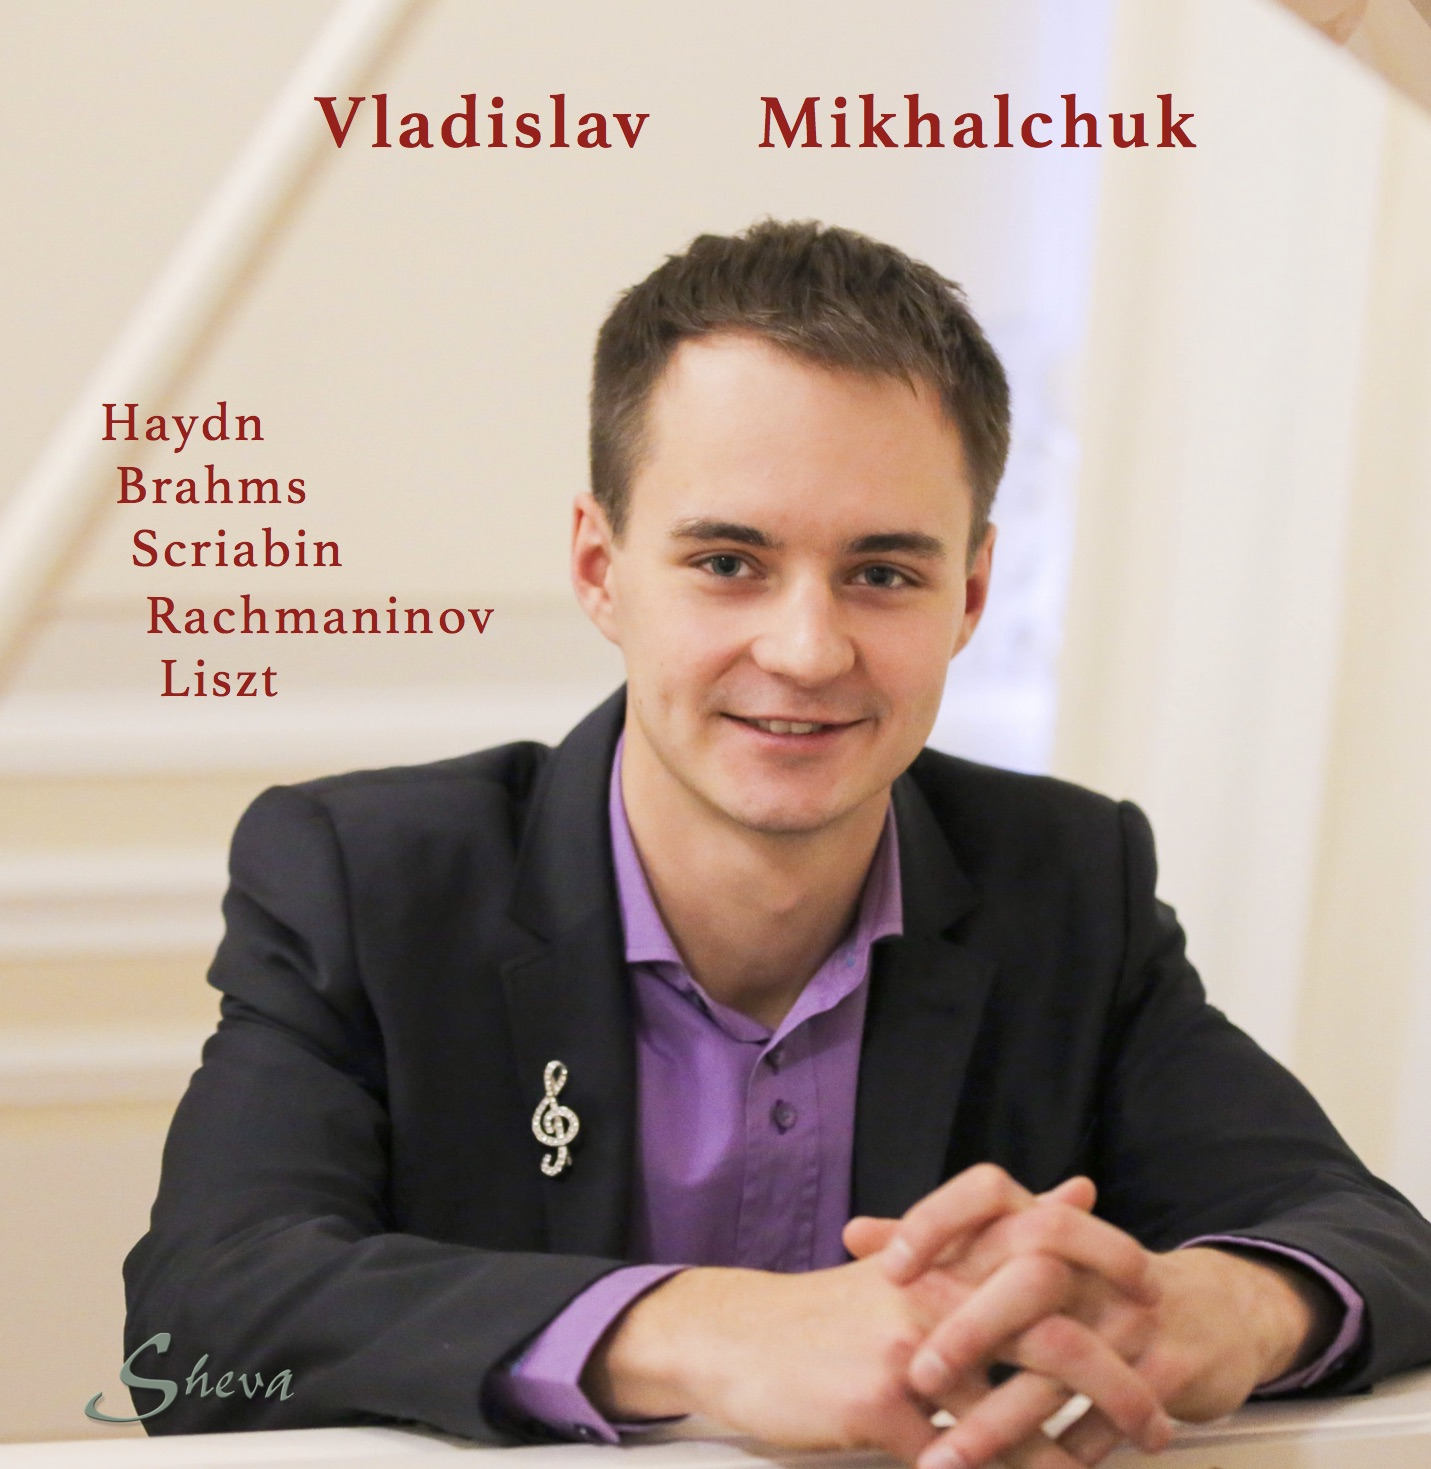 SHEVA 189 VLADISLAV MIKHALCHUK